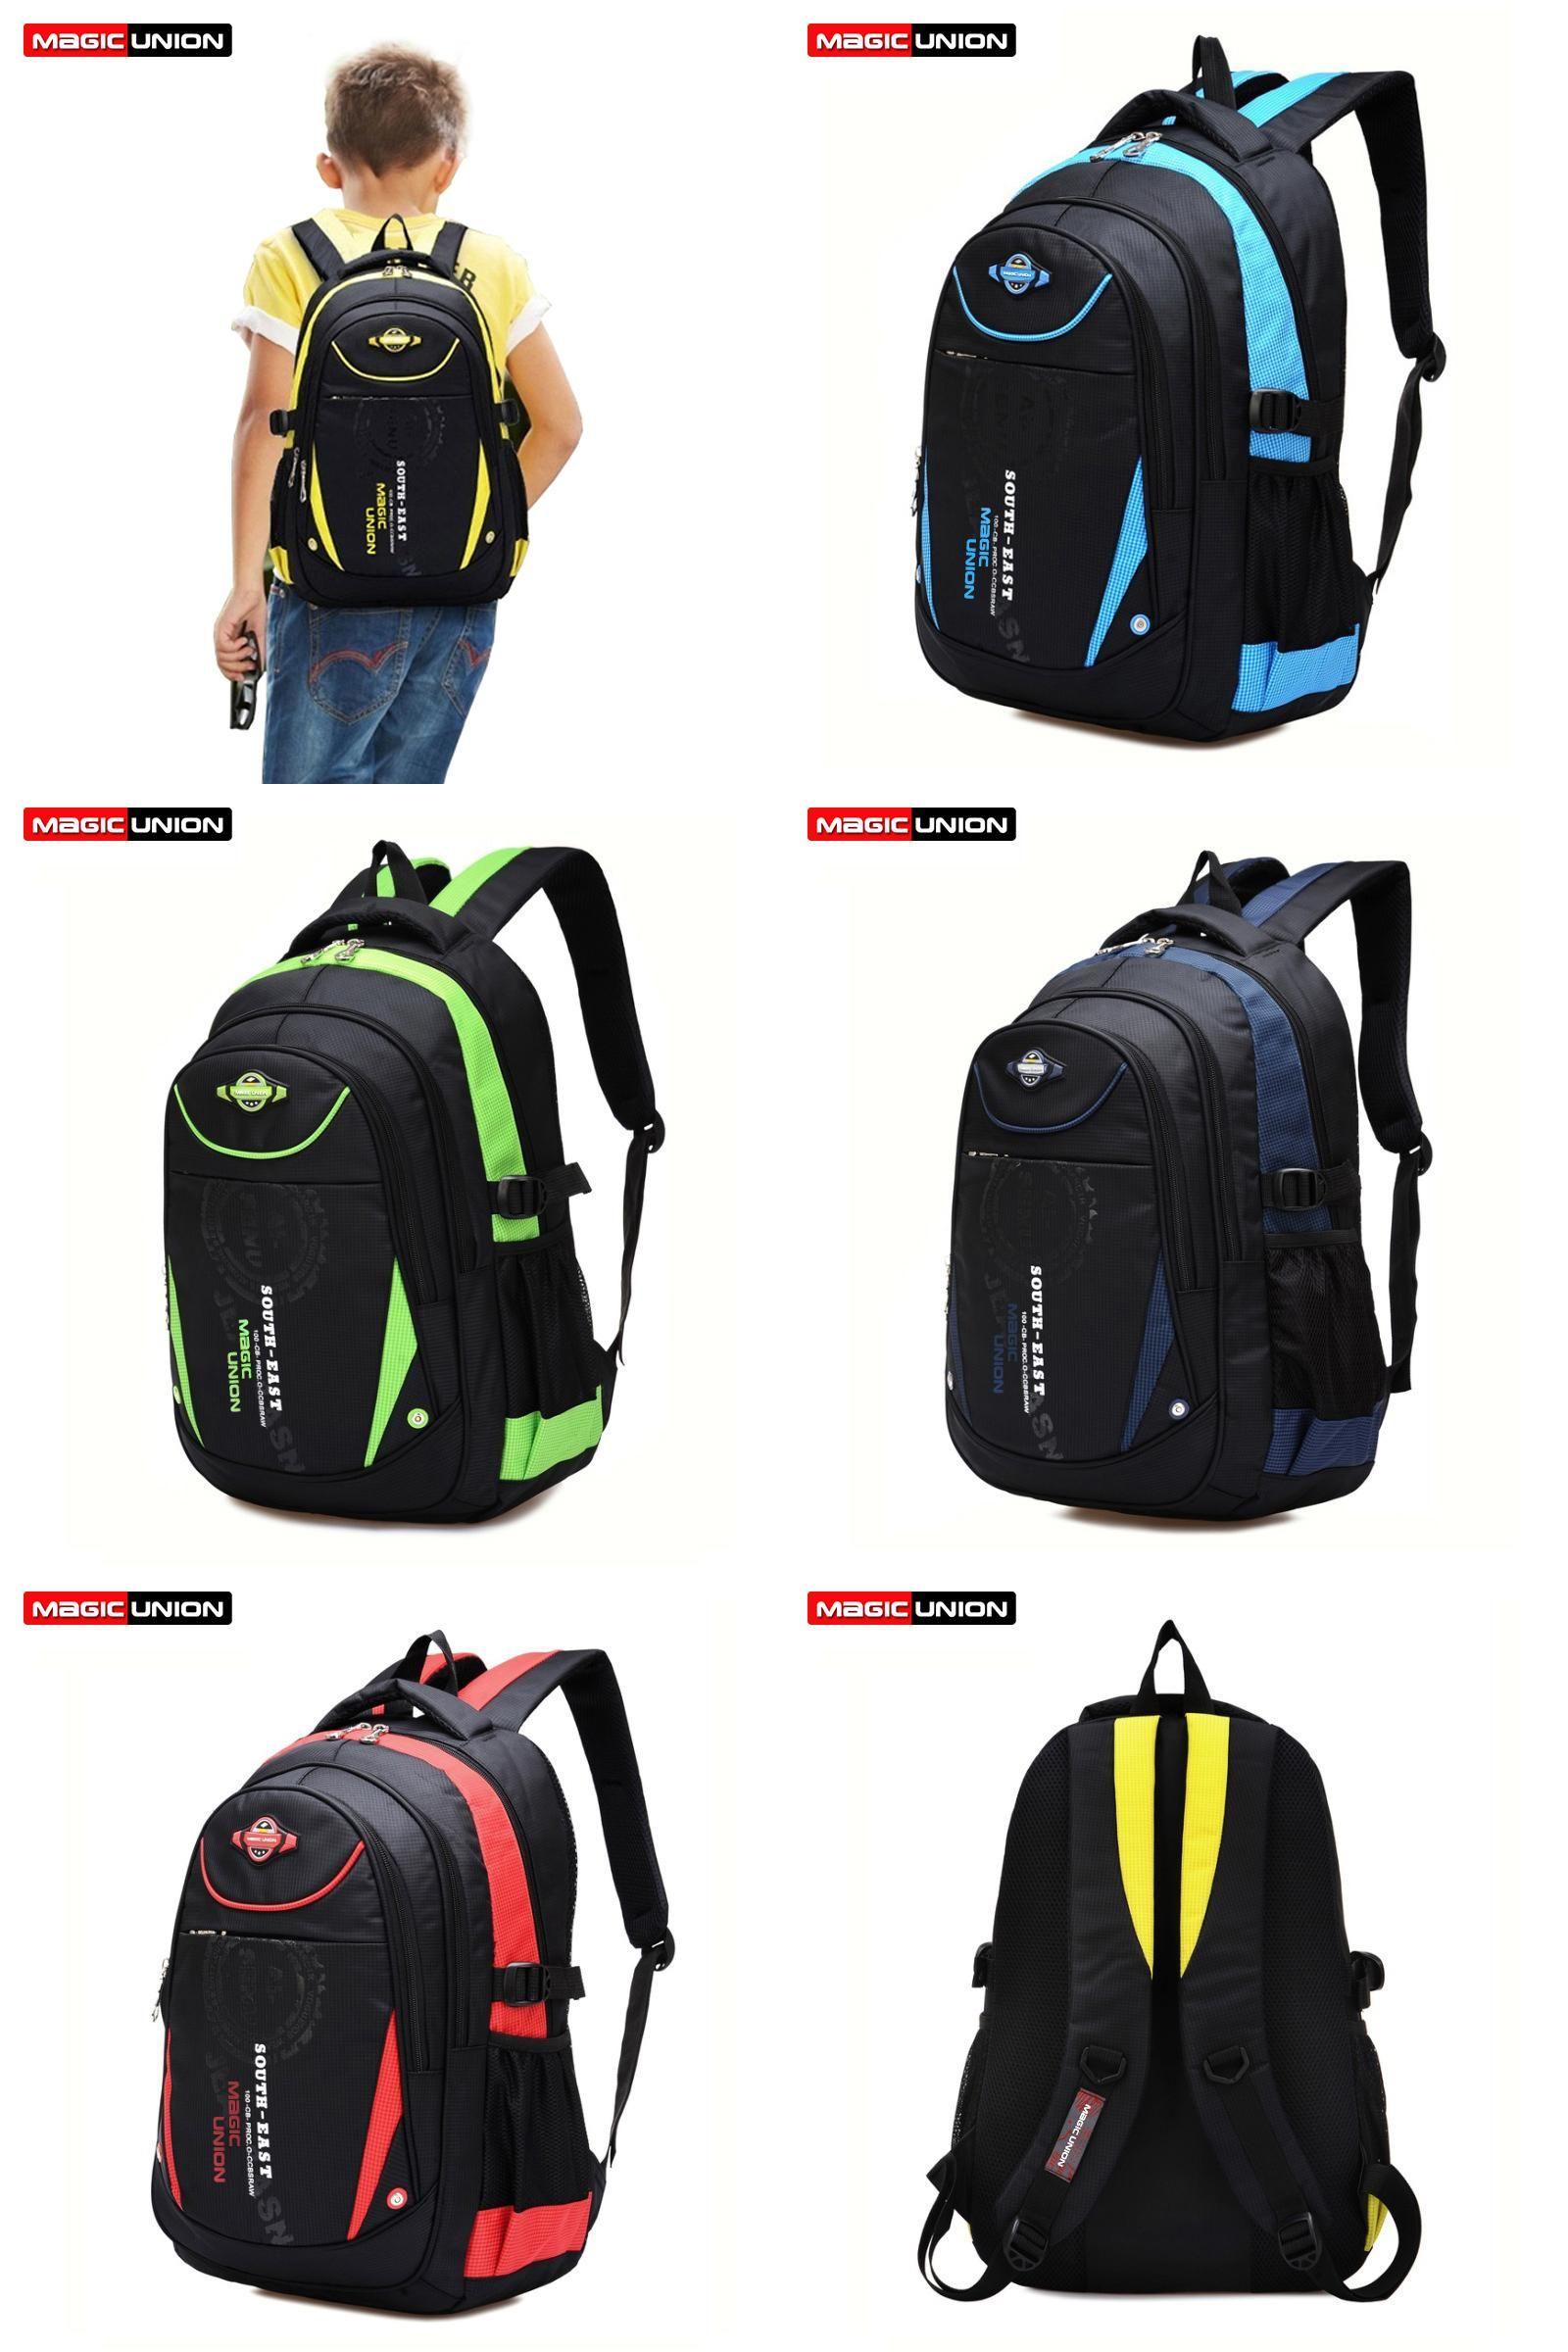 38002c773c08  Visit to Buy  MAGIC UNION High Quality School Bags for Boys Girls Children  Backpacks